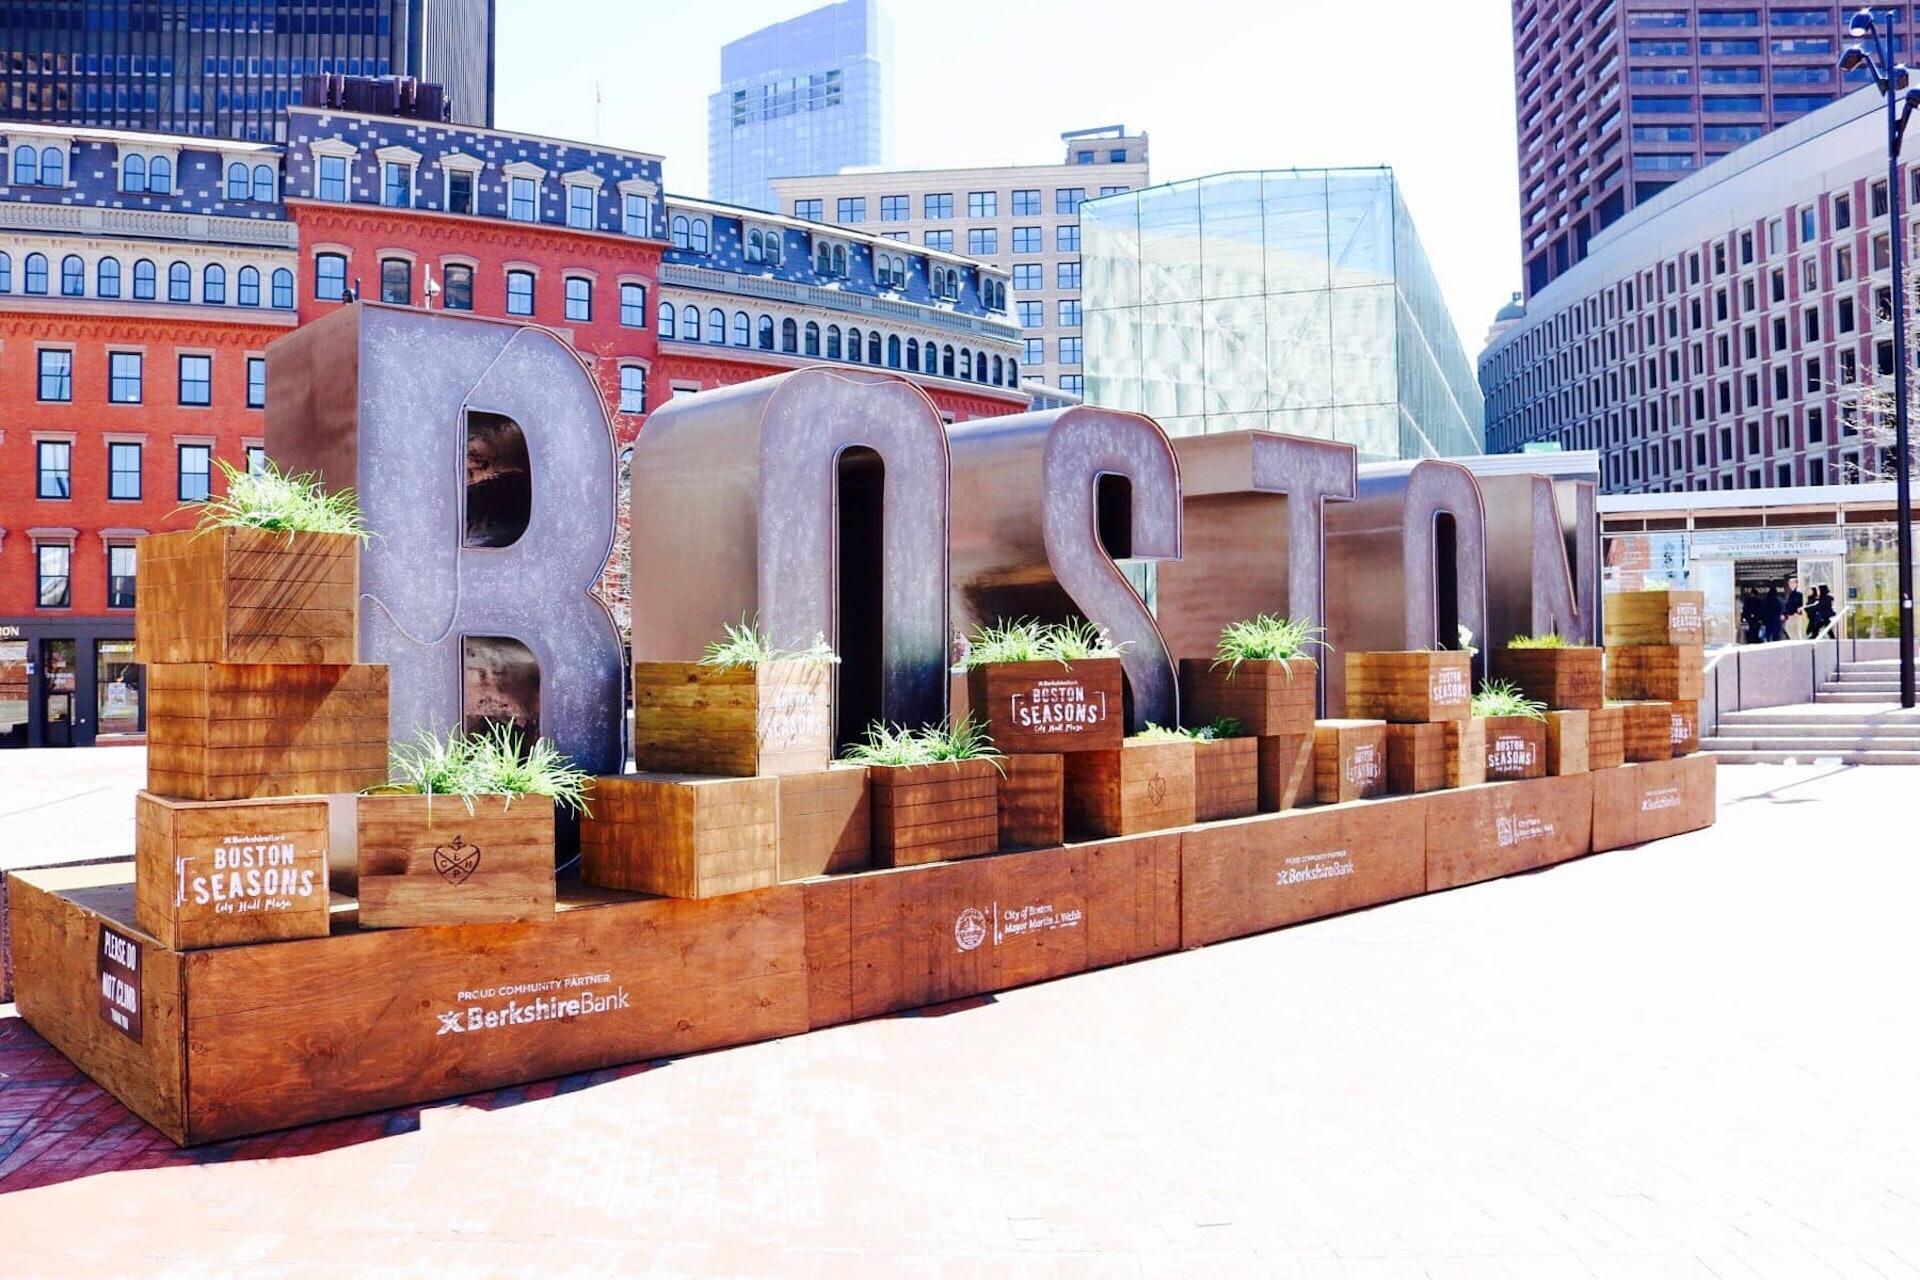 Boston sculpture in city center